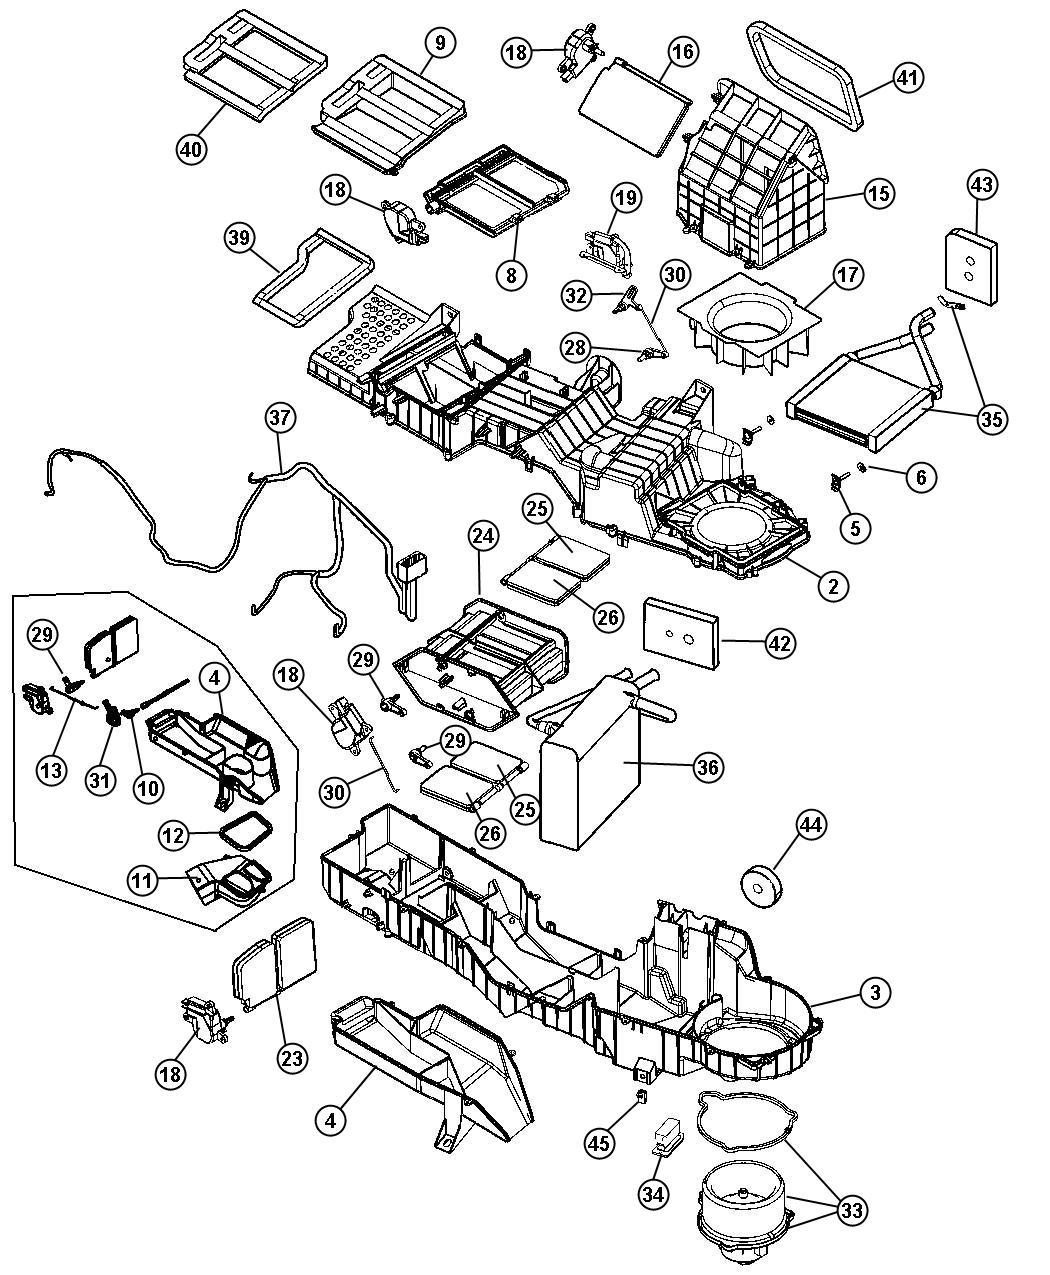 2006 Dodge Ram 2500 Coupling Actuator Air Conditioning Manual Guide